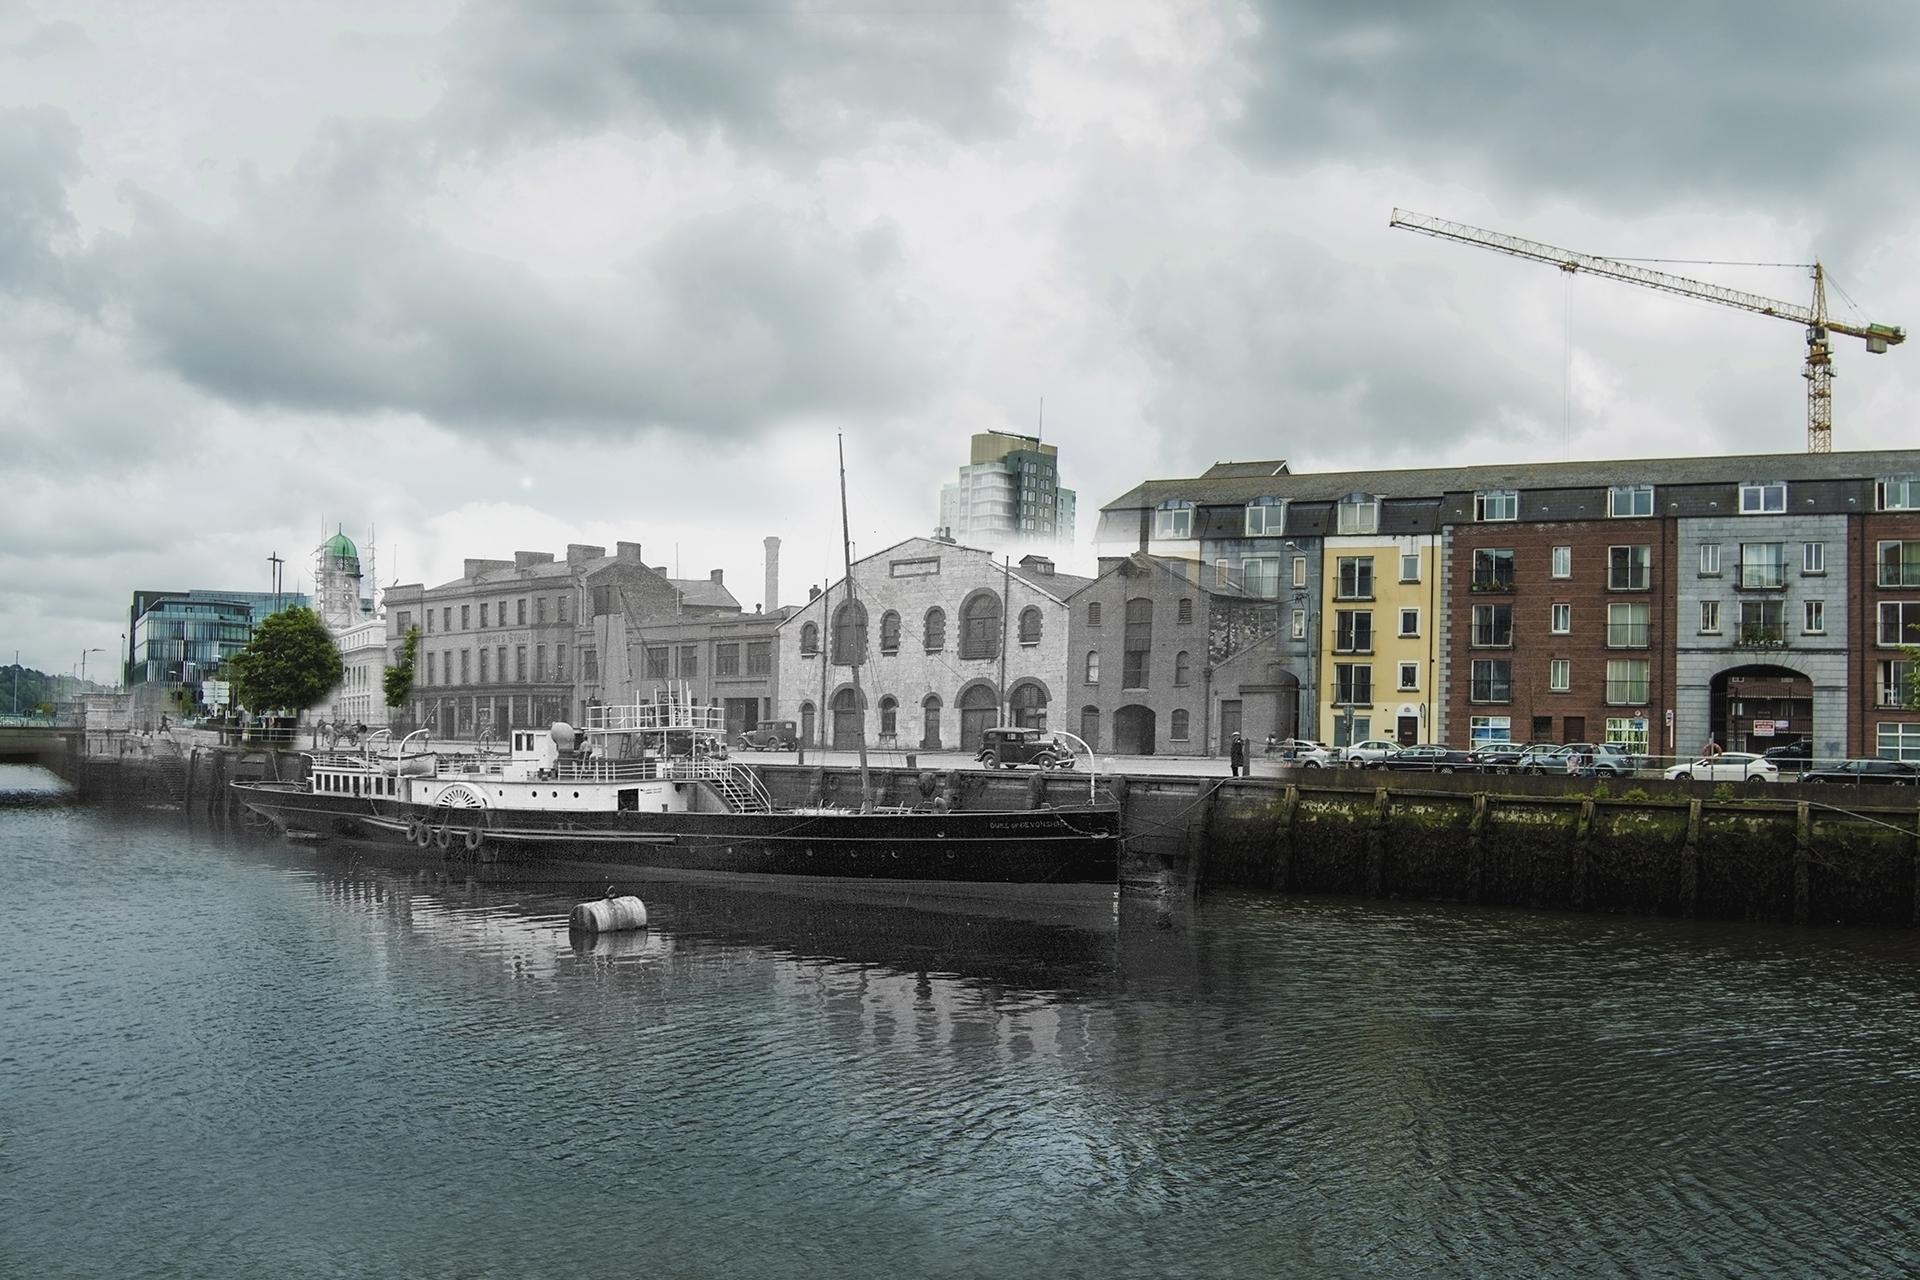 Union Quay